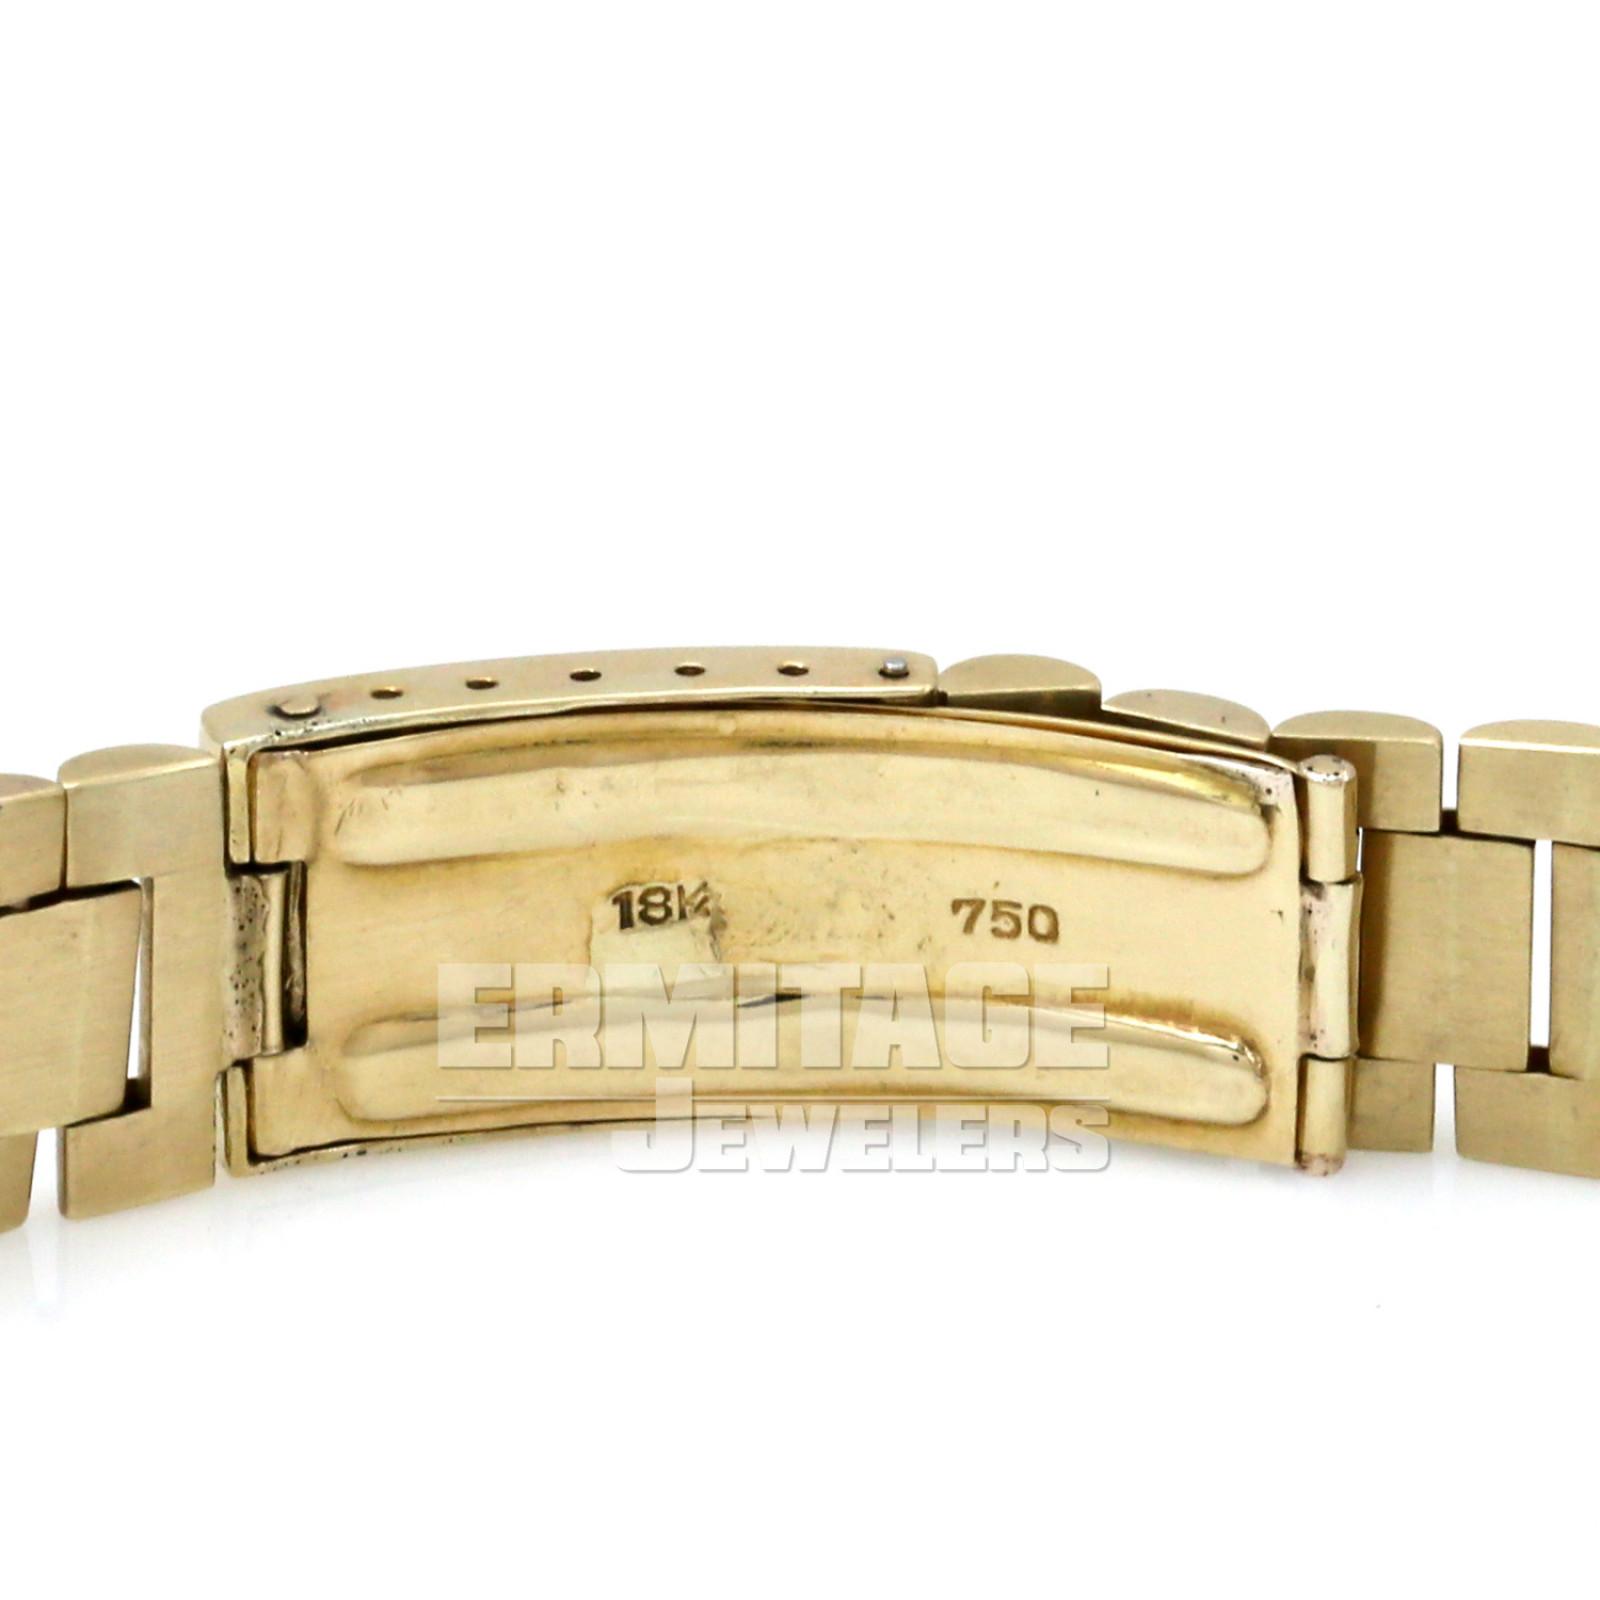 Vintage Rolex 1807 36 mm Yellow Gold on President, Bark Finish Bezel